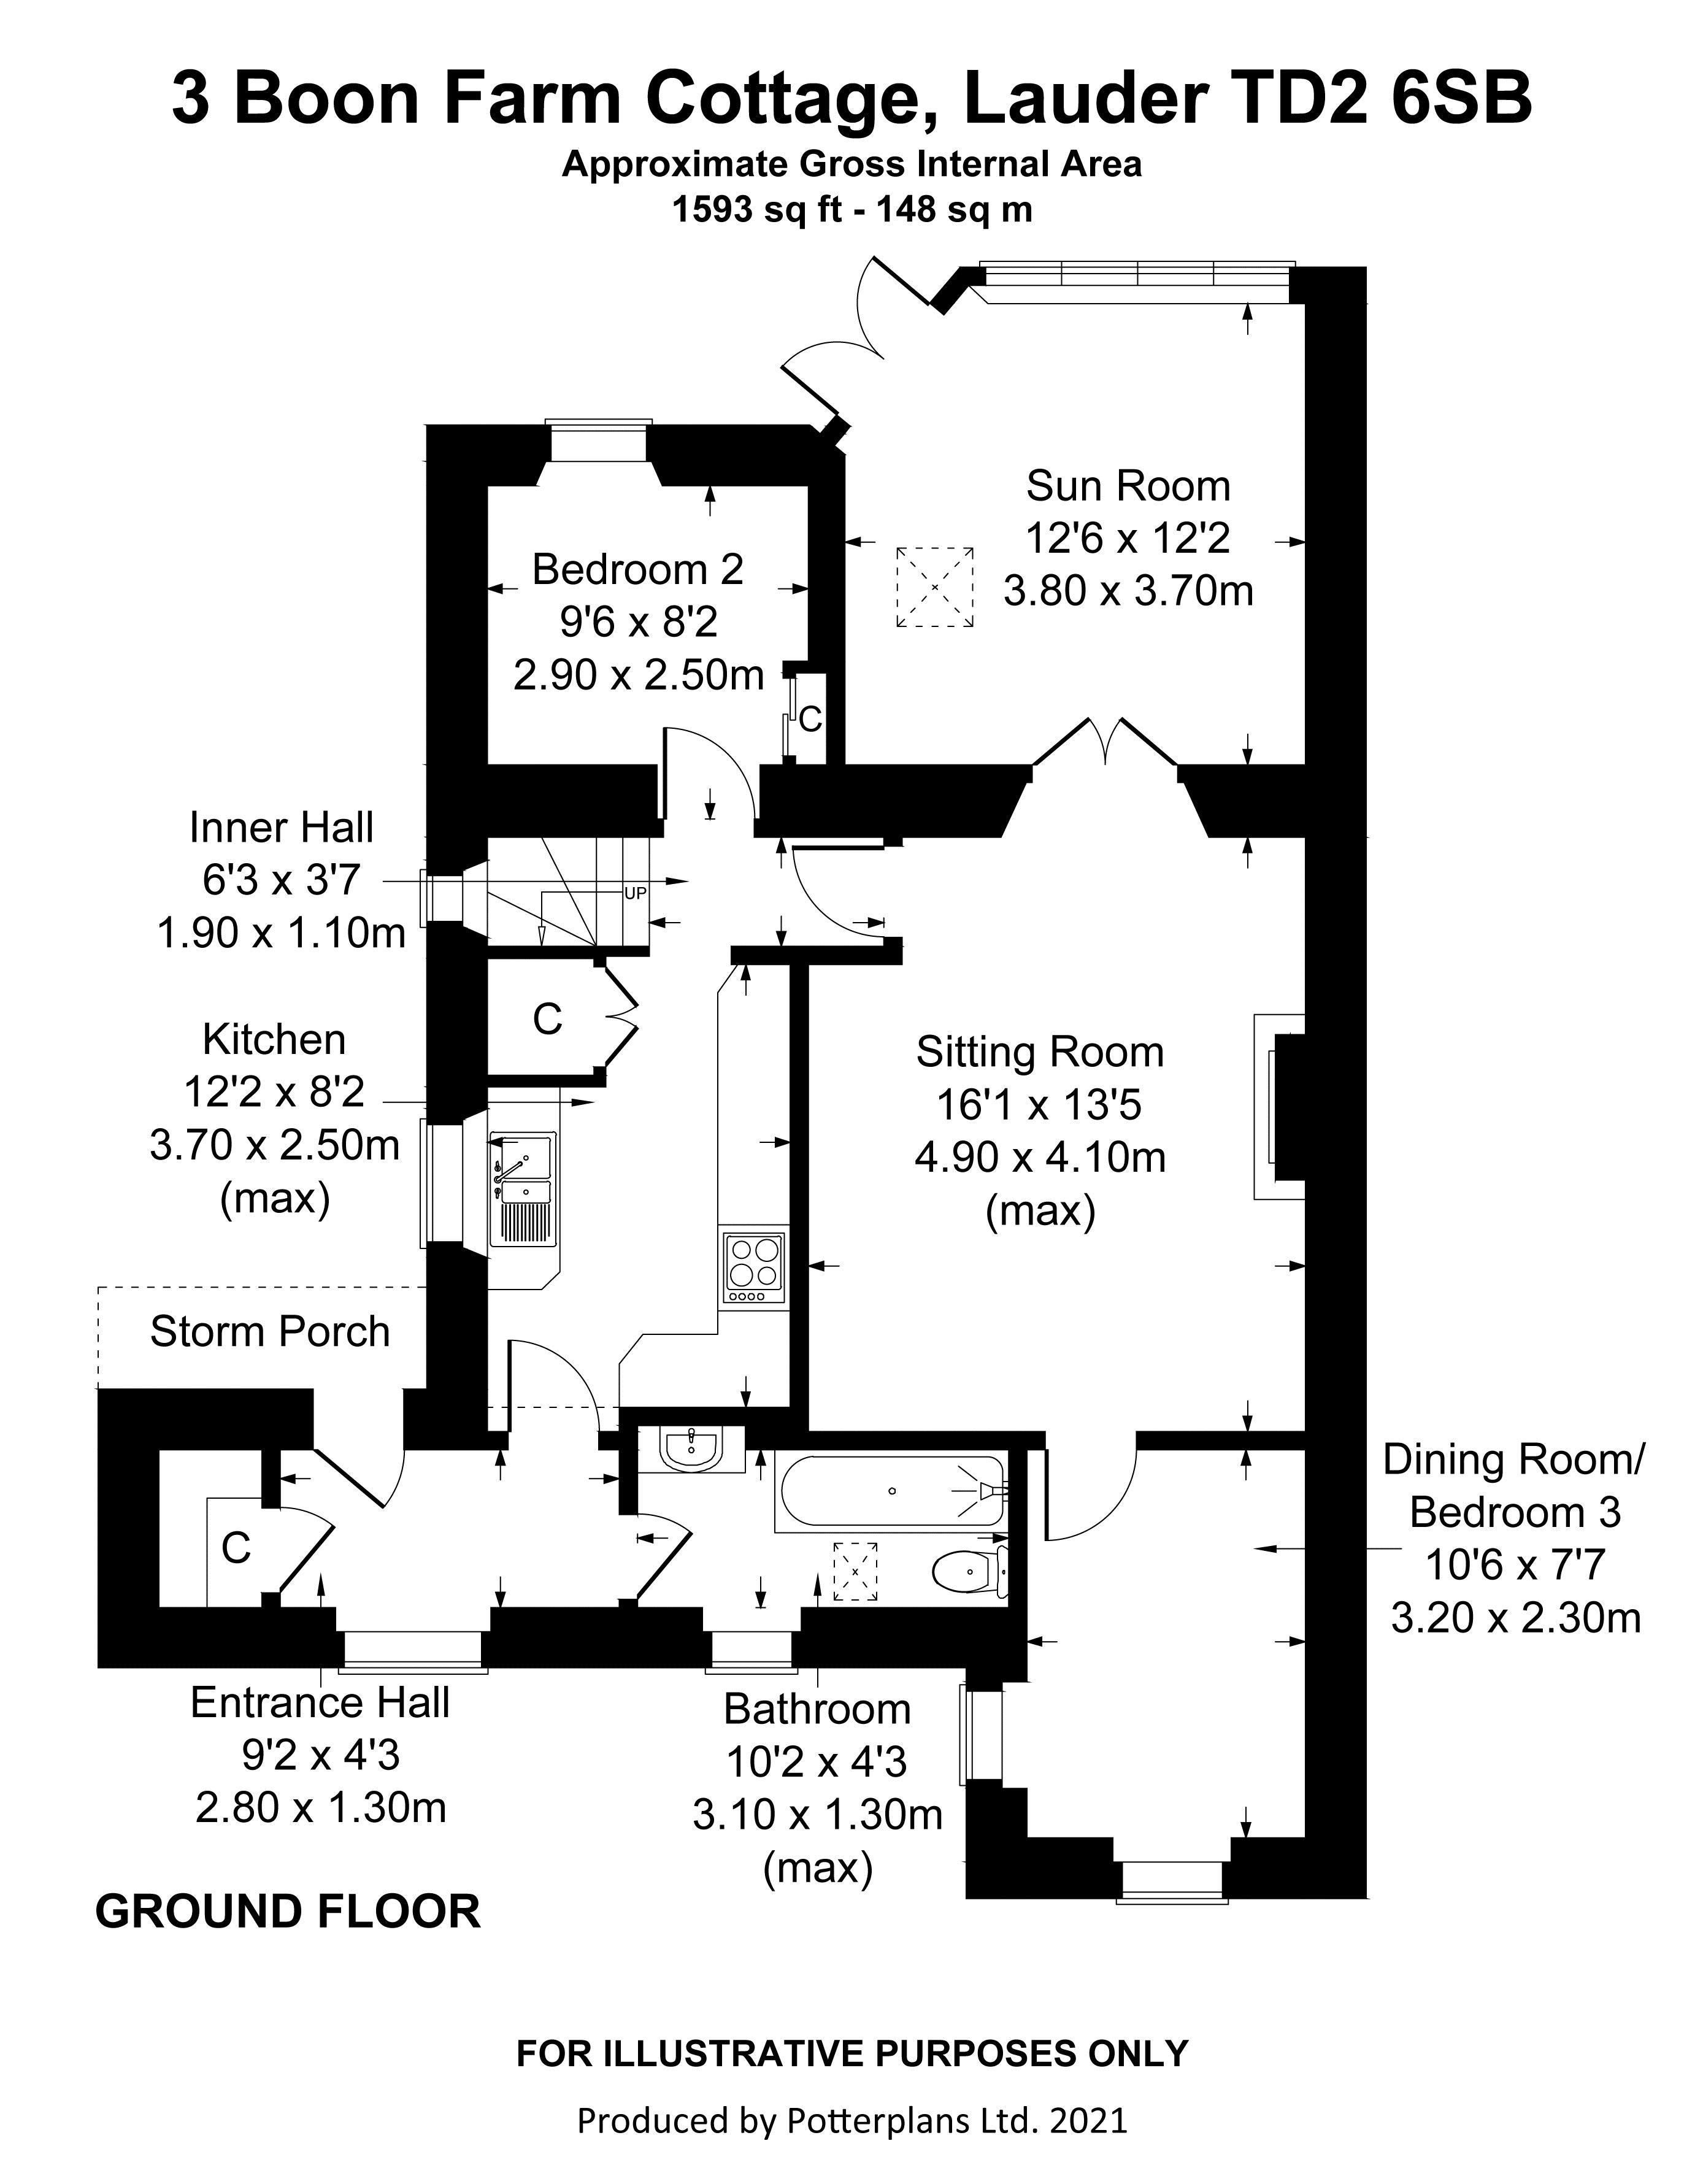 3 Boon Farm Cottage Ground Floor